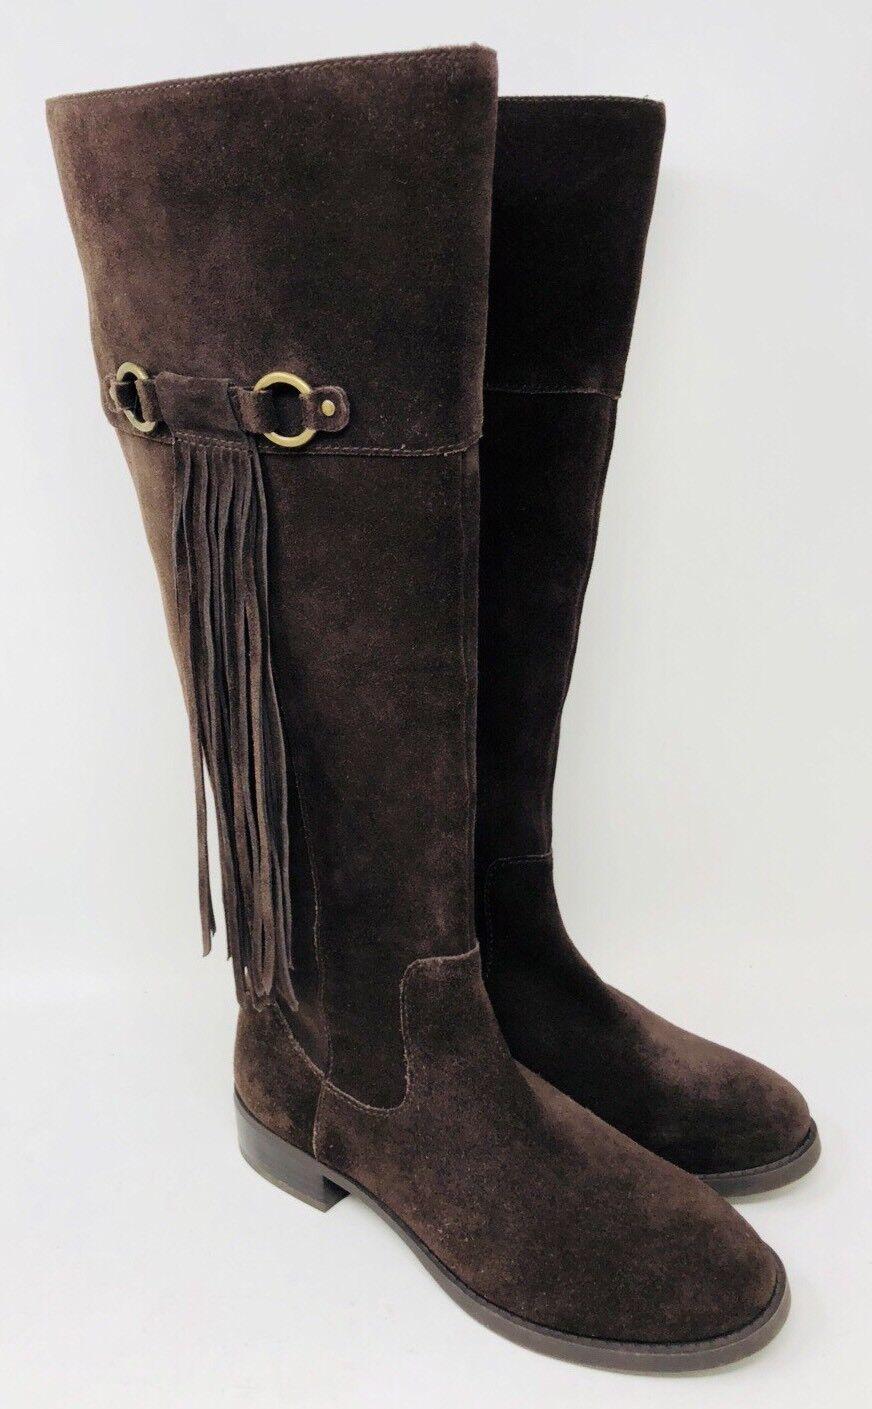 INC International Concepts Fayerbrn Tall Stiefel Wide Calf Braun Suede Größe 5.5